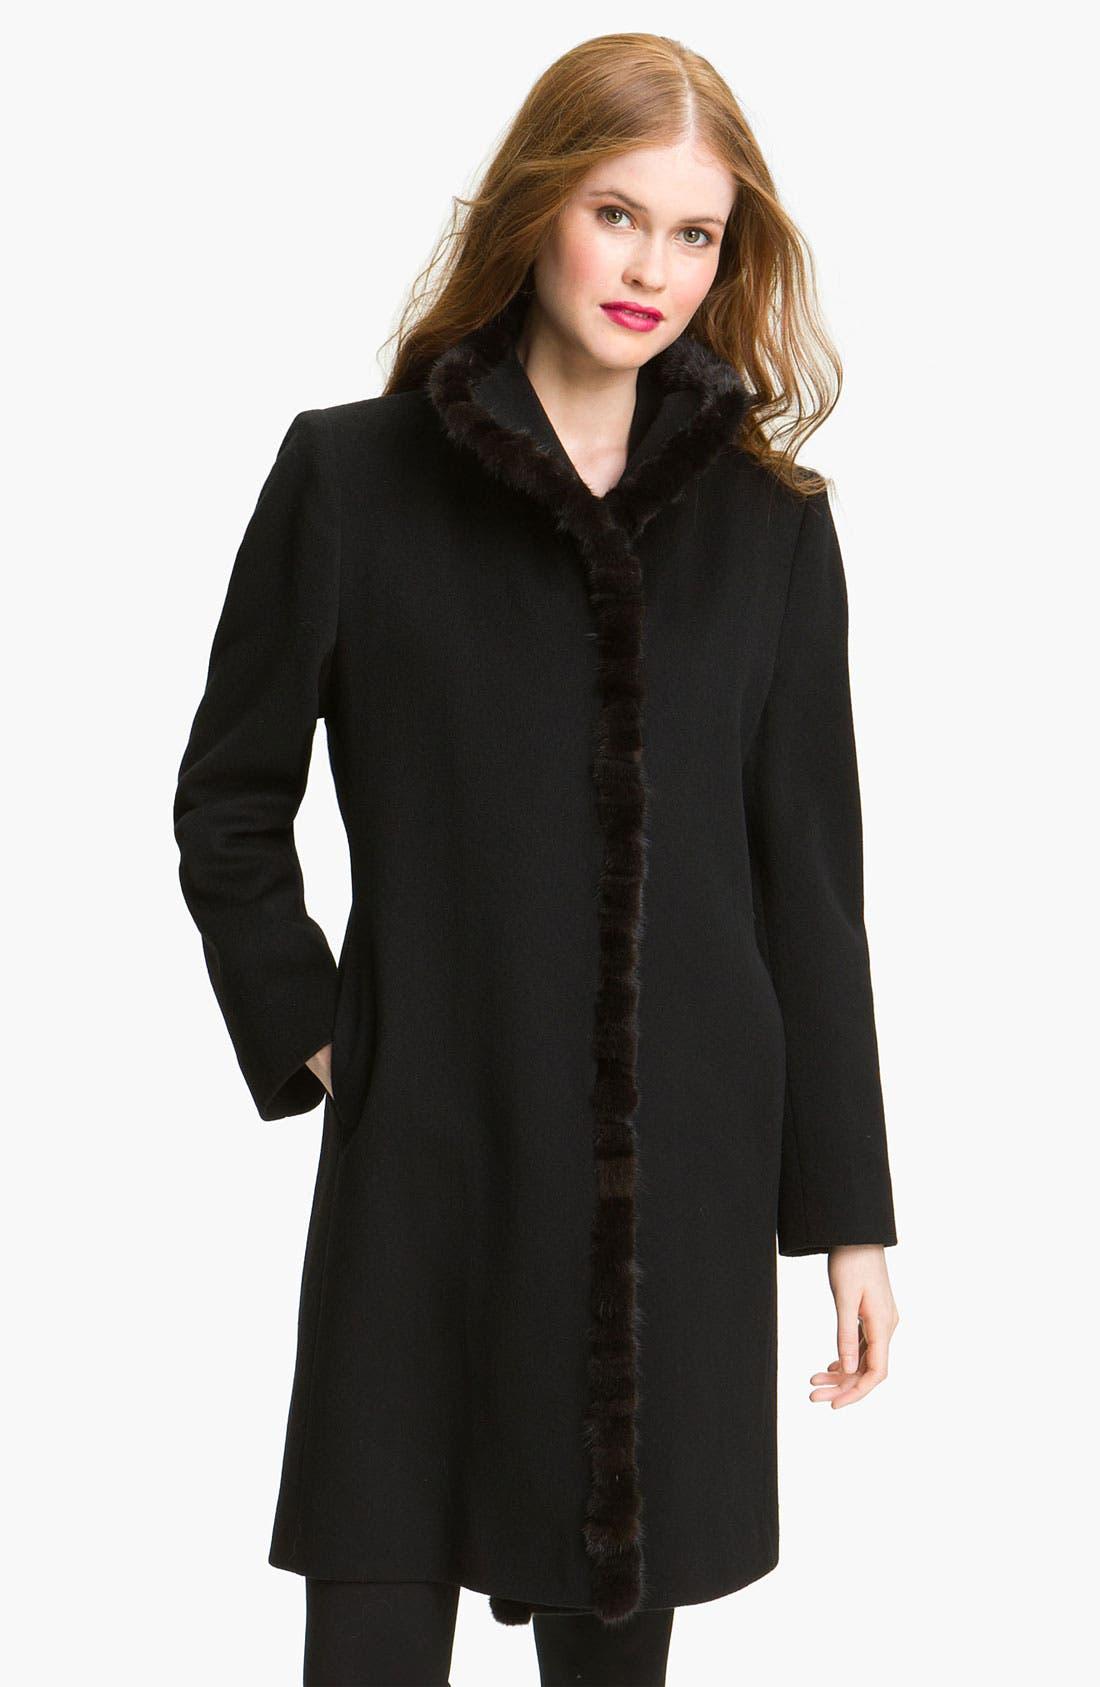 Alternate Image 1 Selected - Fleurette Loro Piana Wool Coat with Genuine Mink Fur